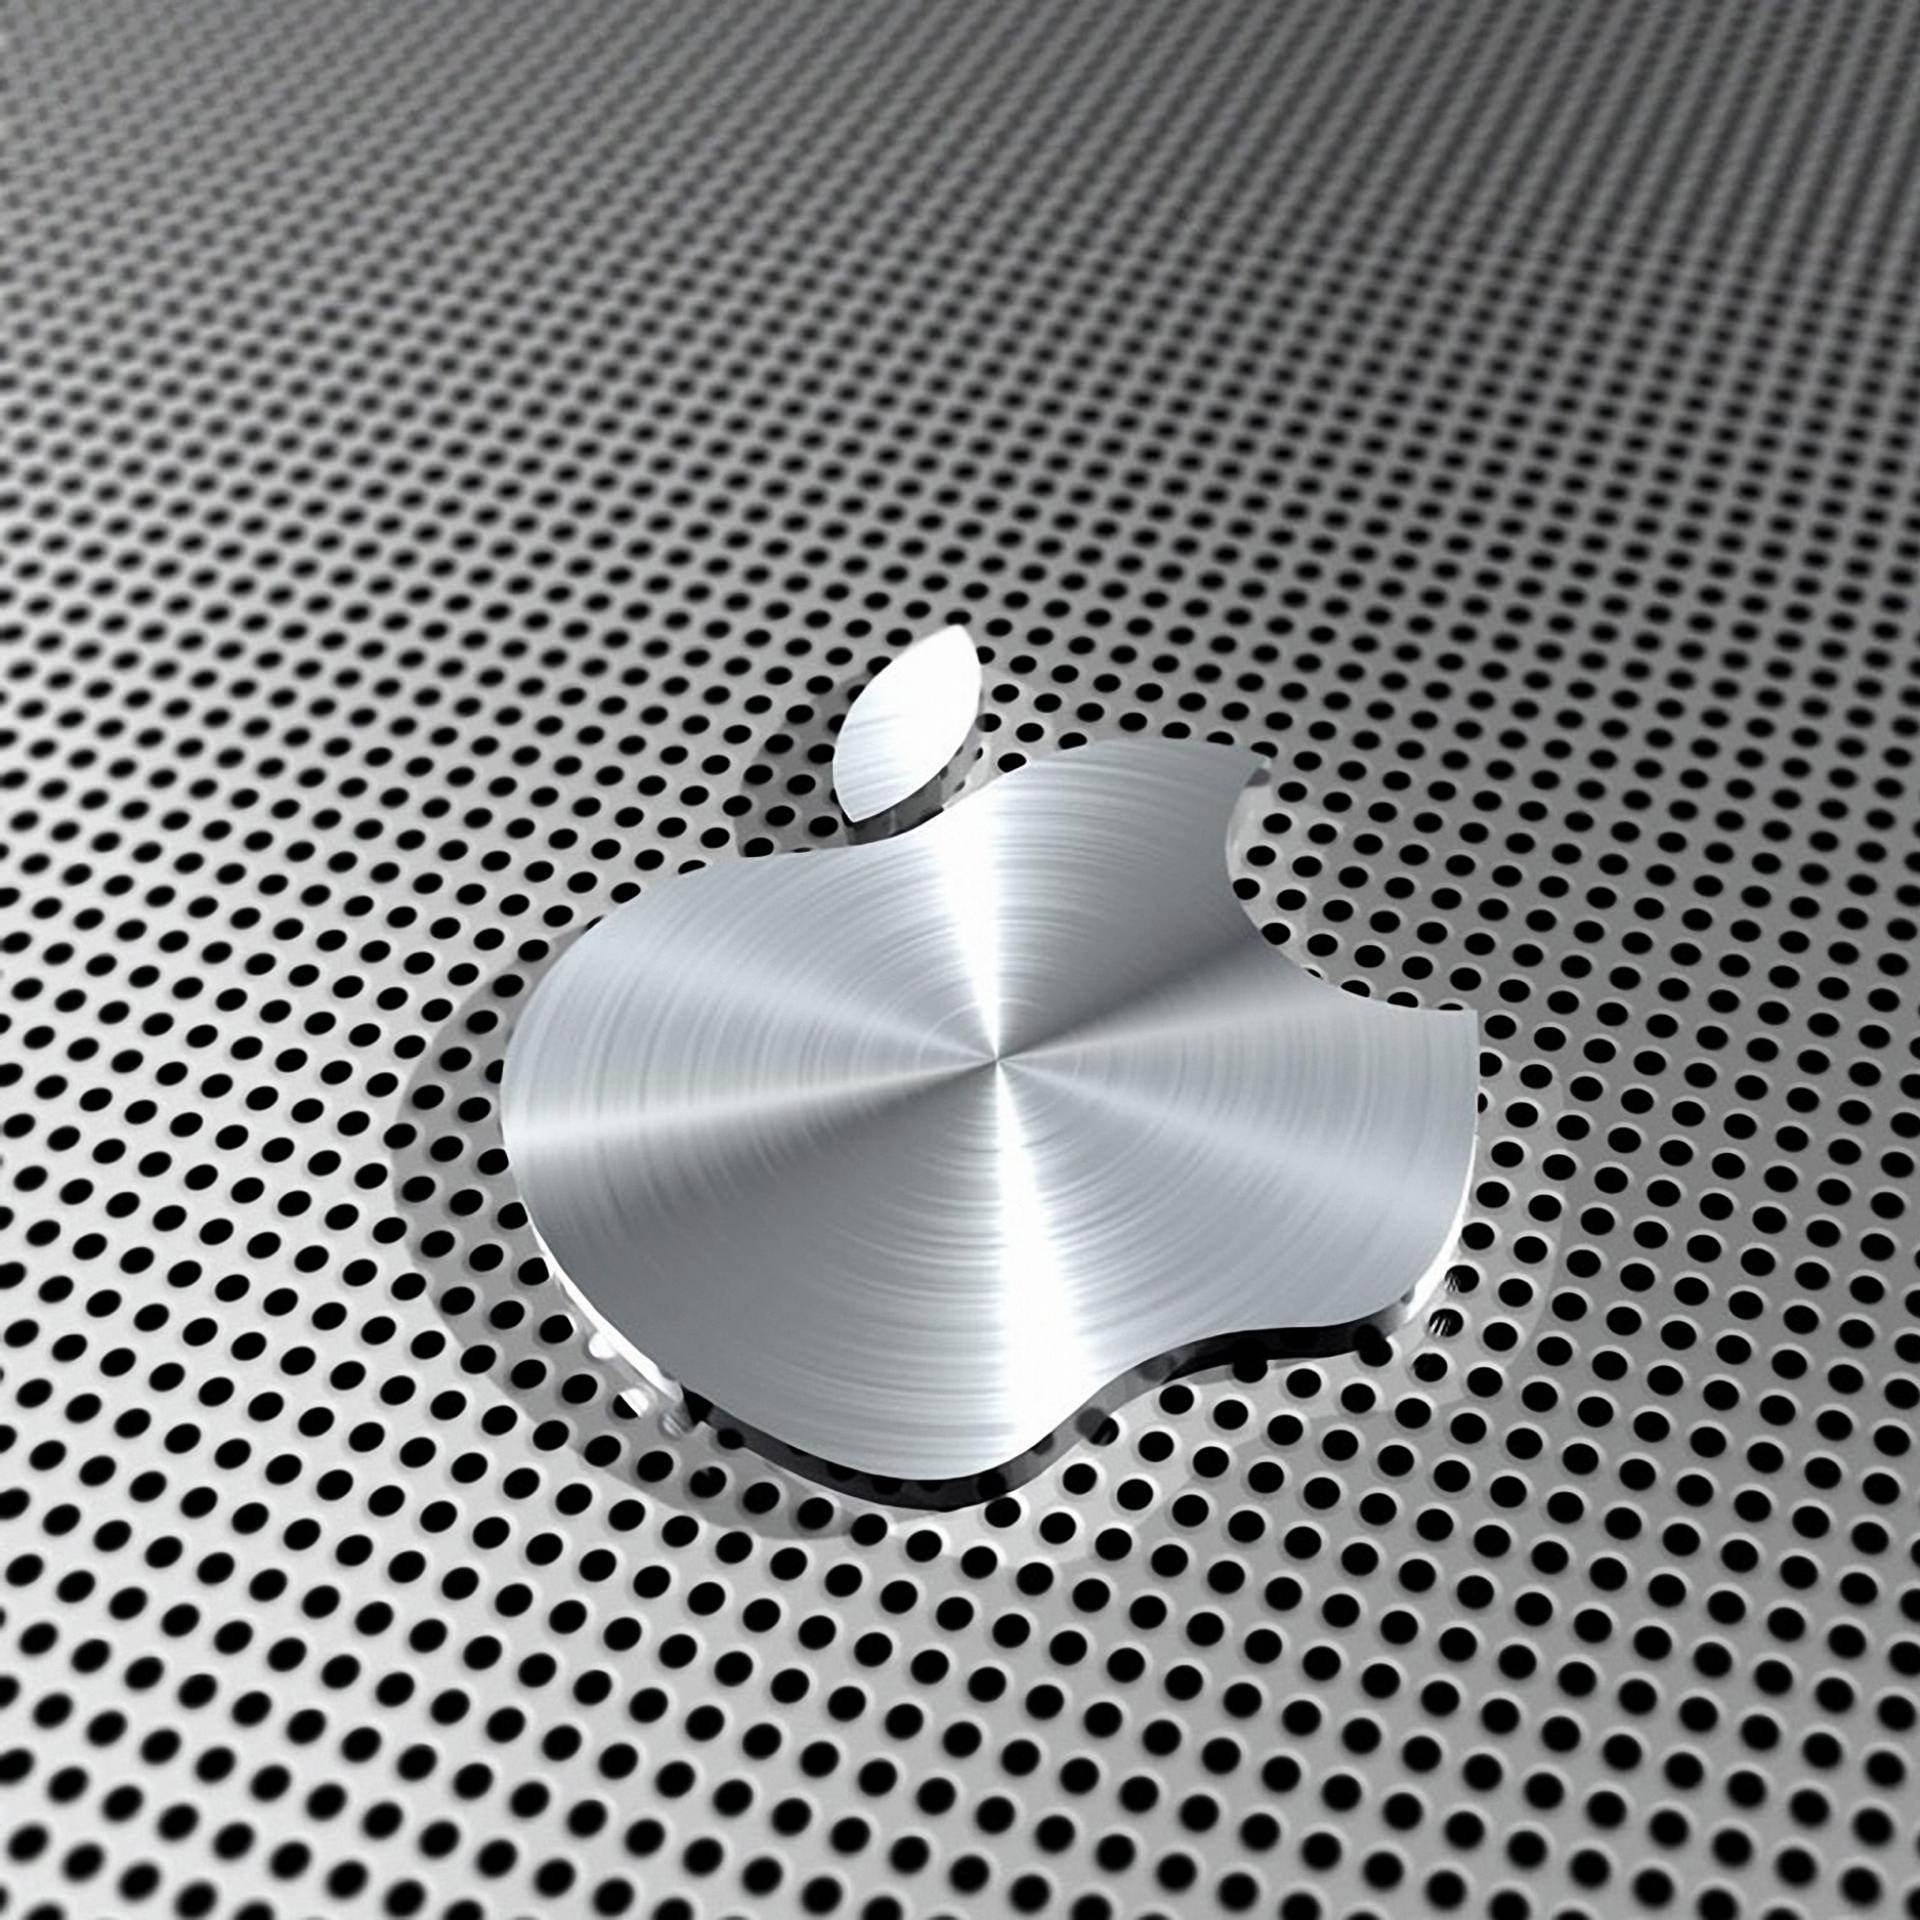 Appleメタル銀 Wallpaper Sc スマホ壁紙